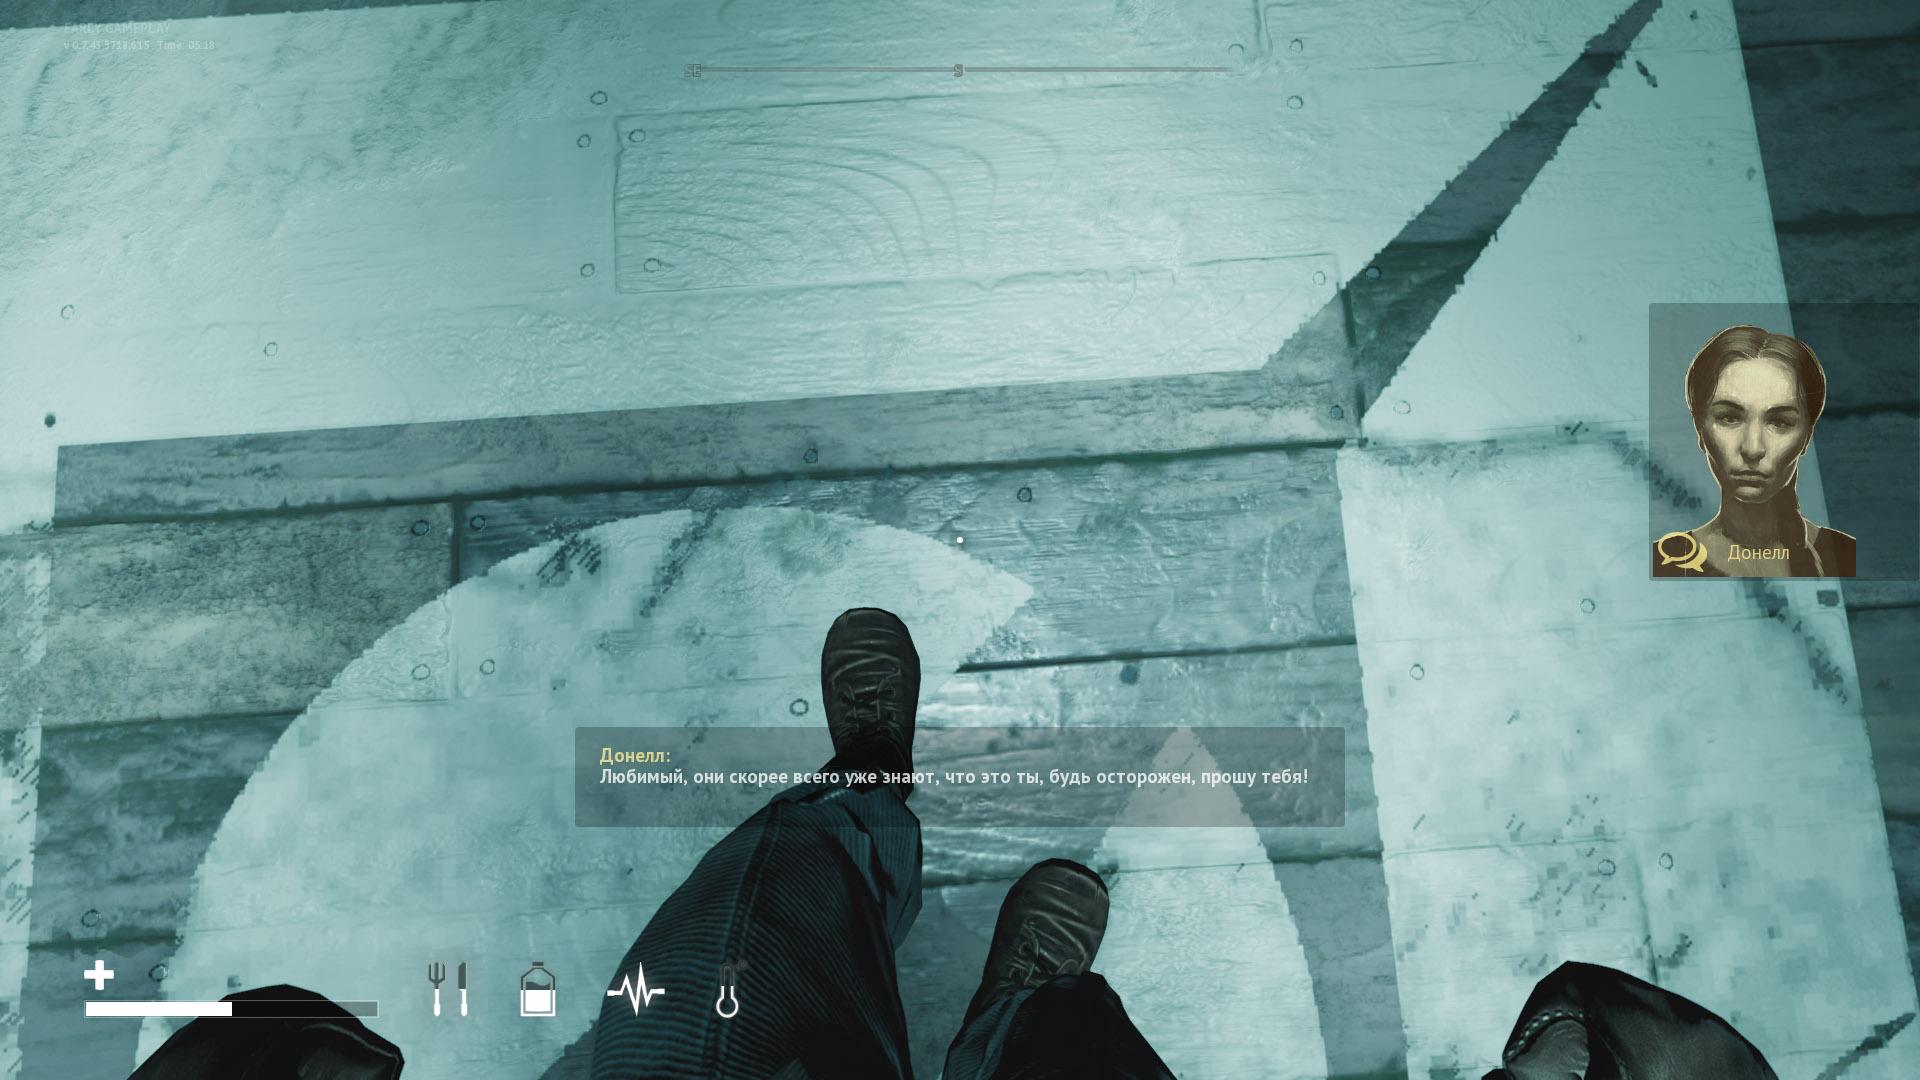 Скриншоты к Desolate v0.8.0.0 на русском языке (Onine/Singleplayer) | Репак от xatab